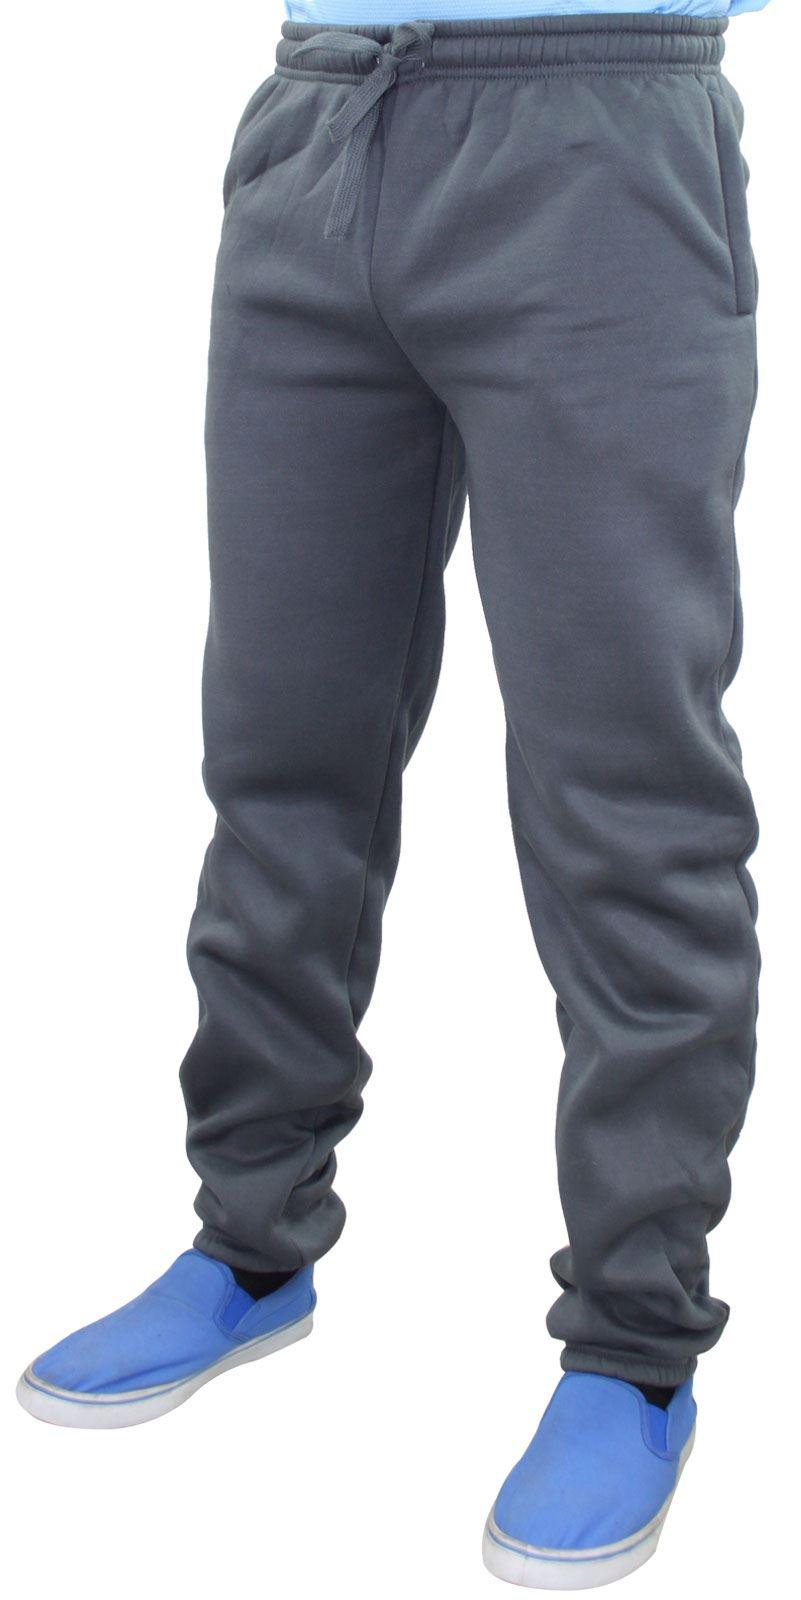 Mens-Women-Plain-Fleece-Joggers-Bottoms-Jogging-Pant-Gym-Fitness-Sports-Trousers thumbnail 3